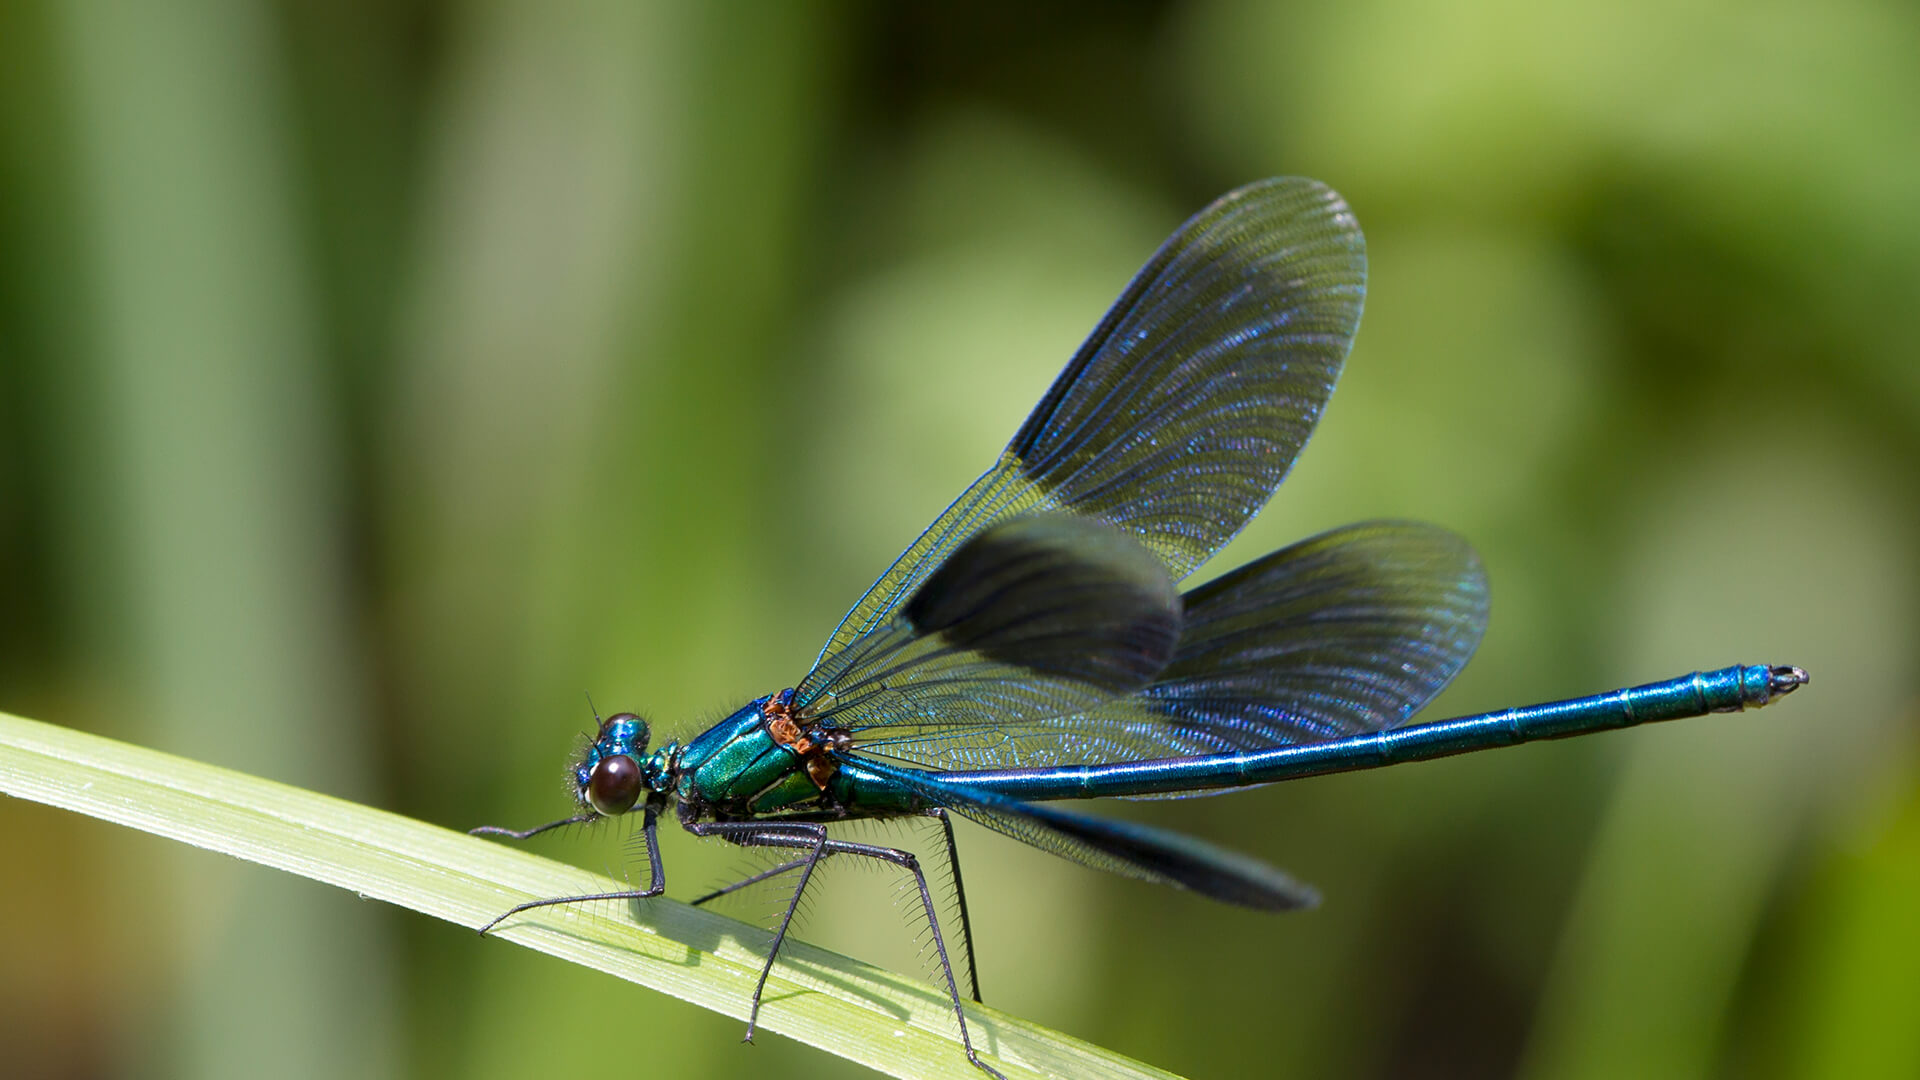 Blue iridescent dragonfly | Dragonflies | Pinterest |Iridescent Dragonflies